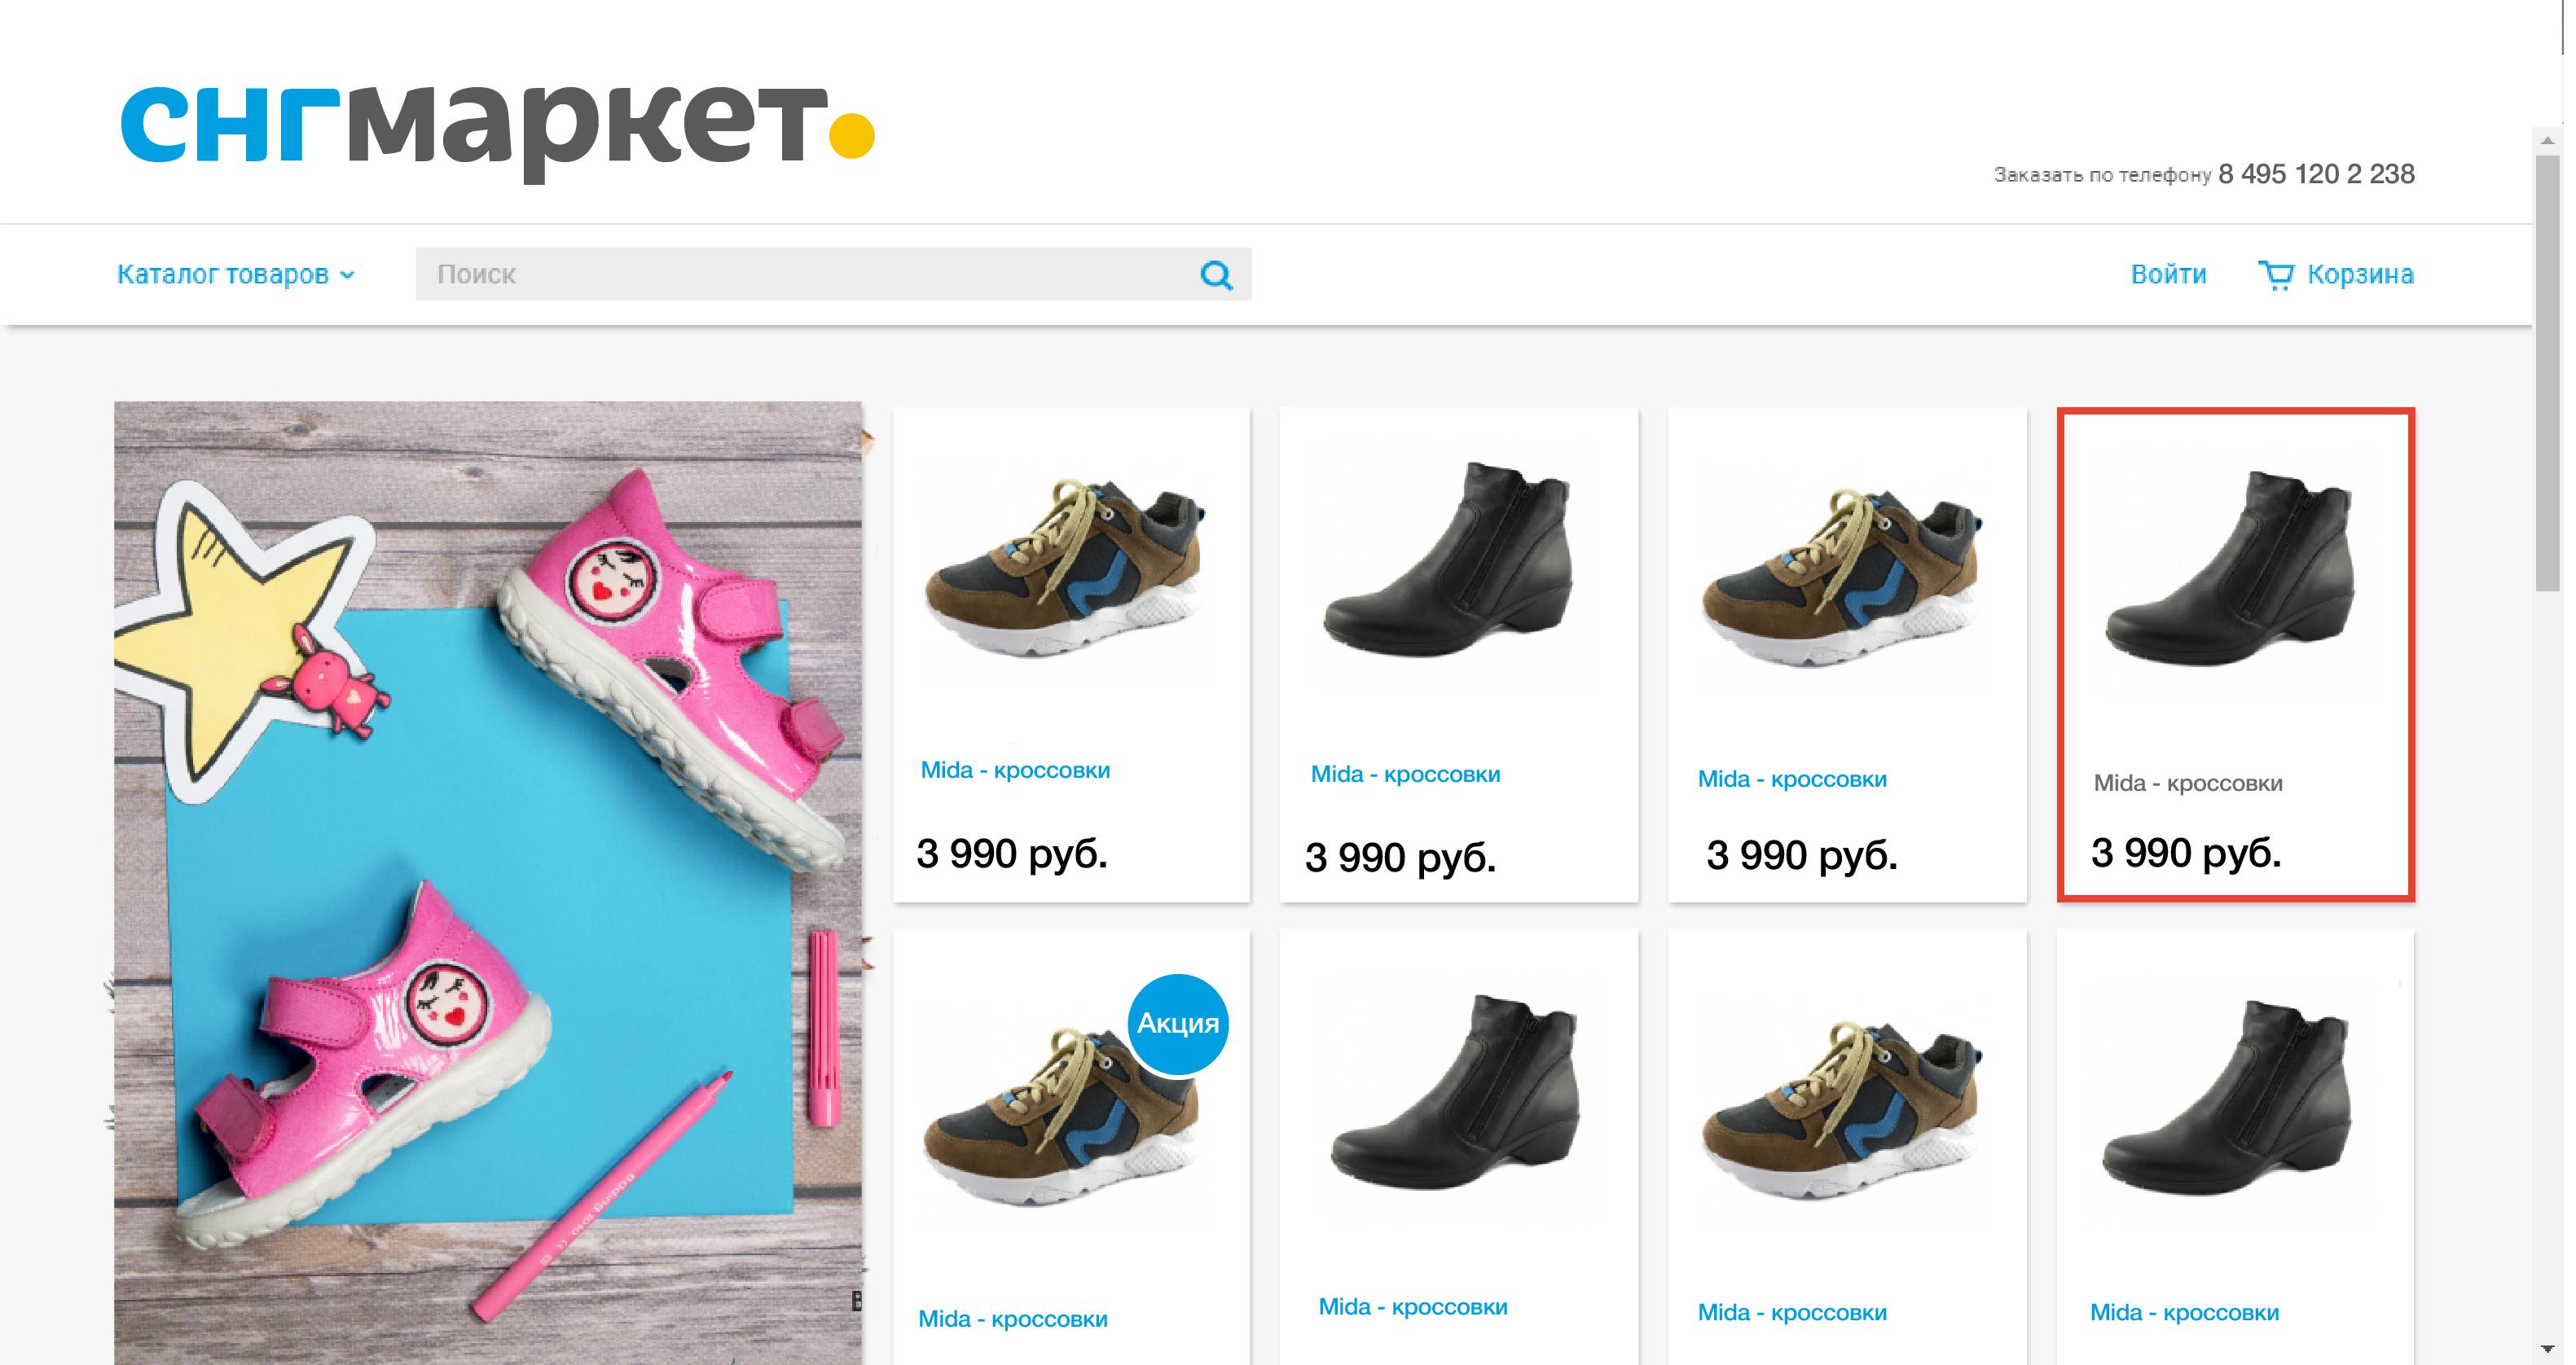 Объявляется конкурс на создание логотипа ИМ обуви фото f_8335a14c41d81195.jpg